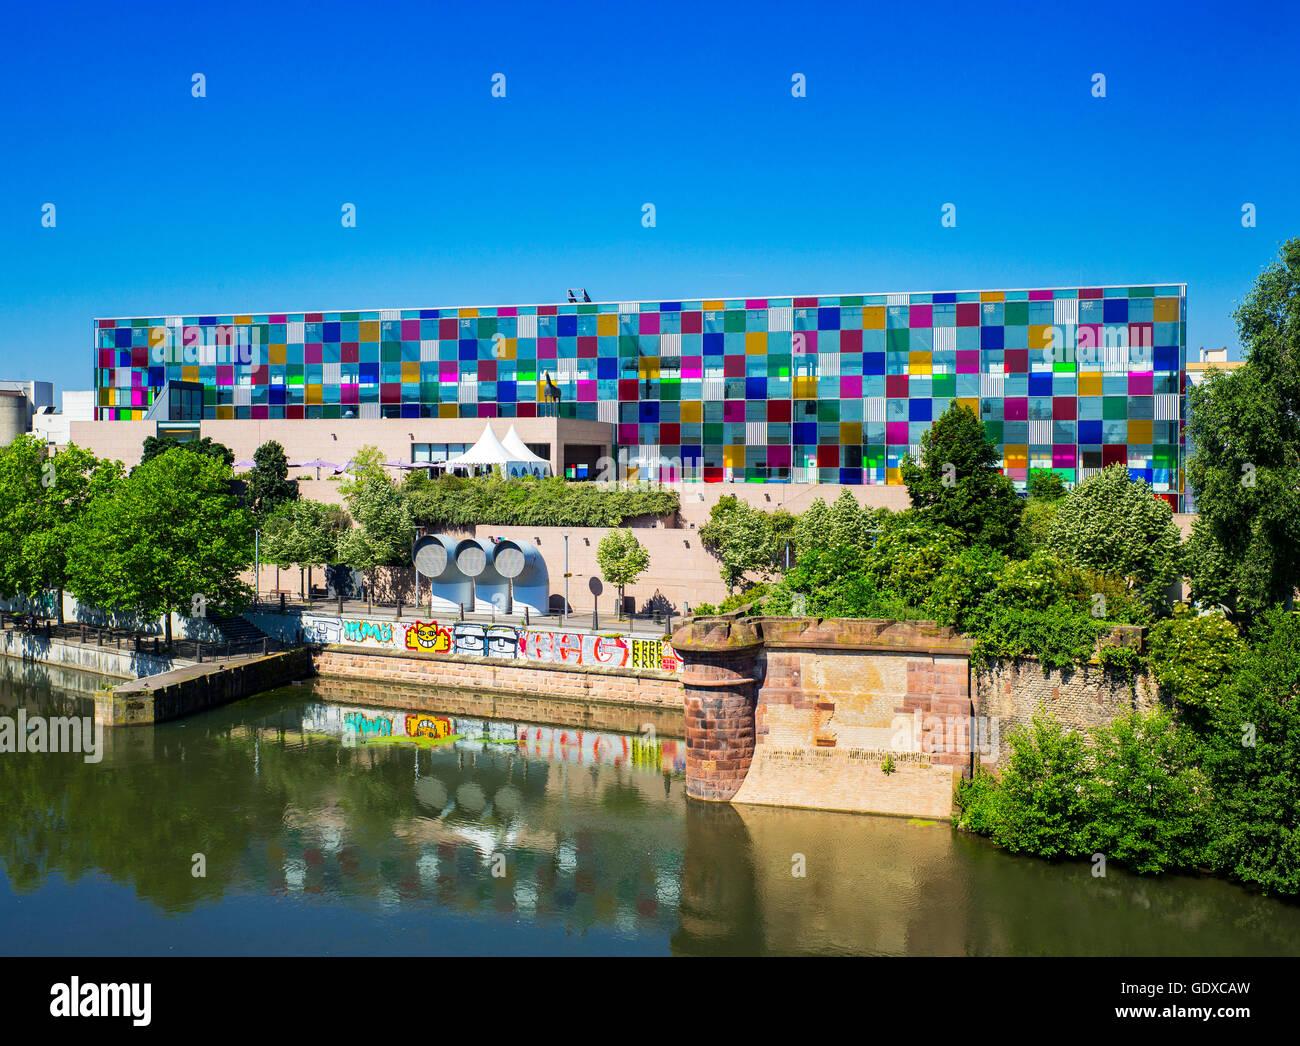 Museum of Modern and Contemporary Art, Strasbourg, Alsace, France, Europe, MAMCS, Musée d'Art Moderne et Contemporain Stock Photo